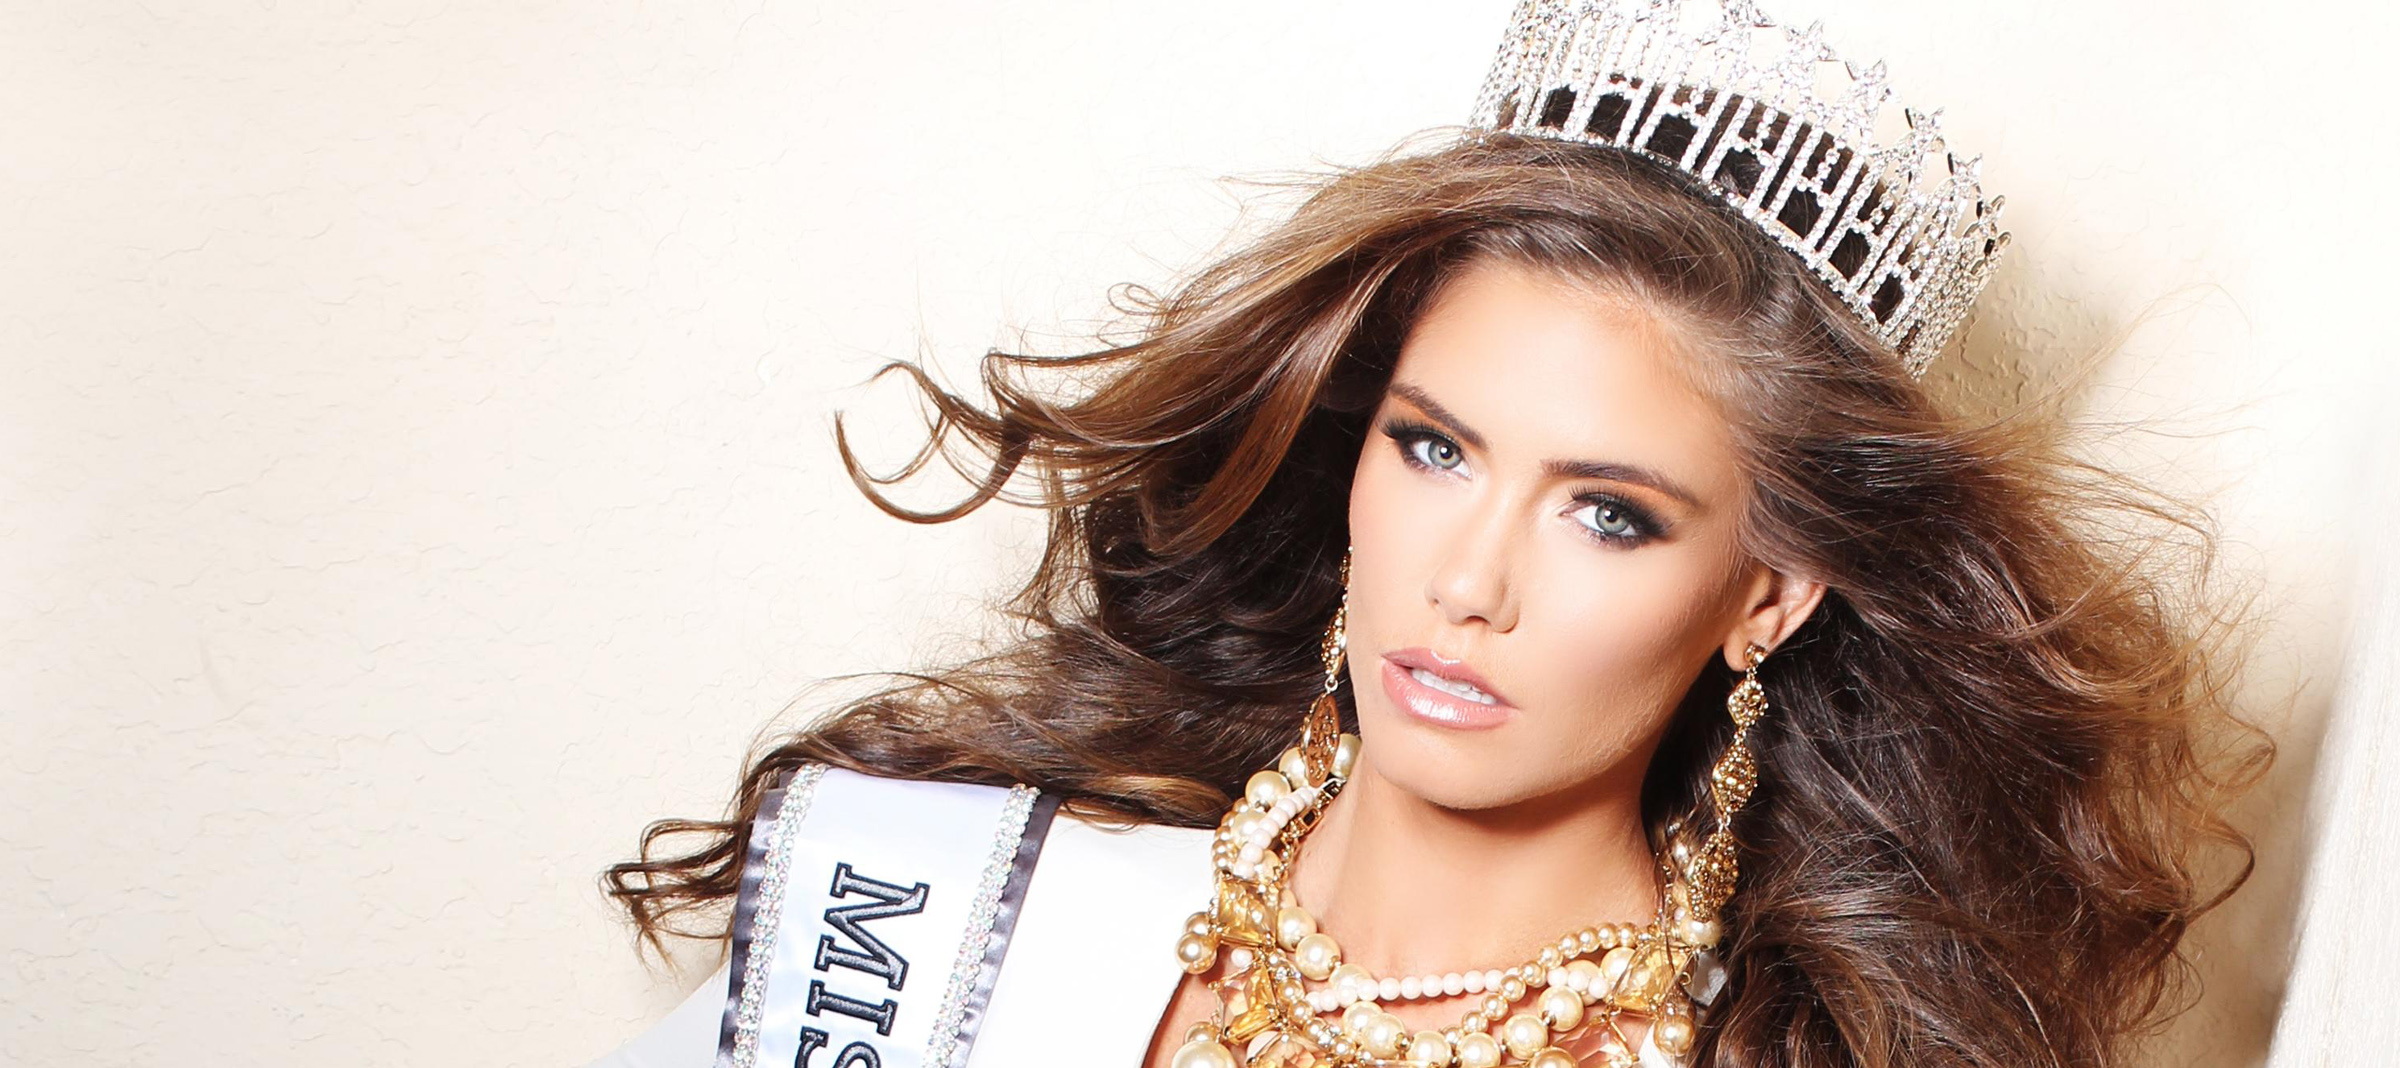 Brittany Oldehoff | MISS FL USA 2014